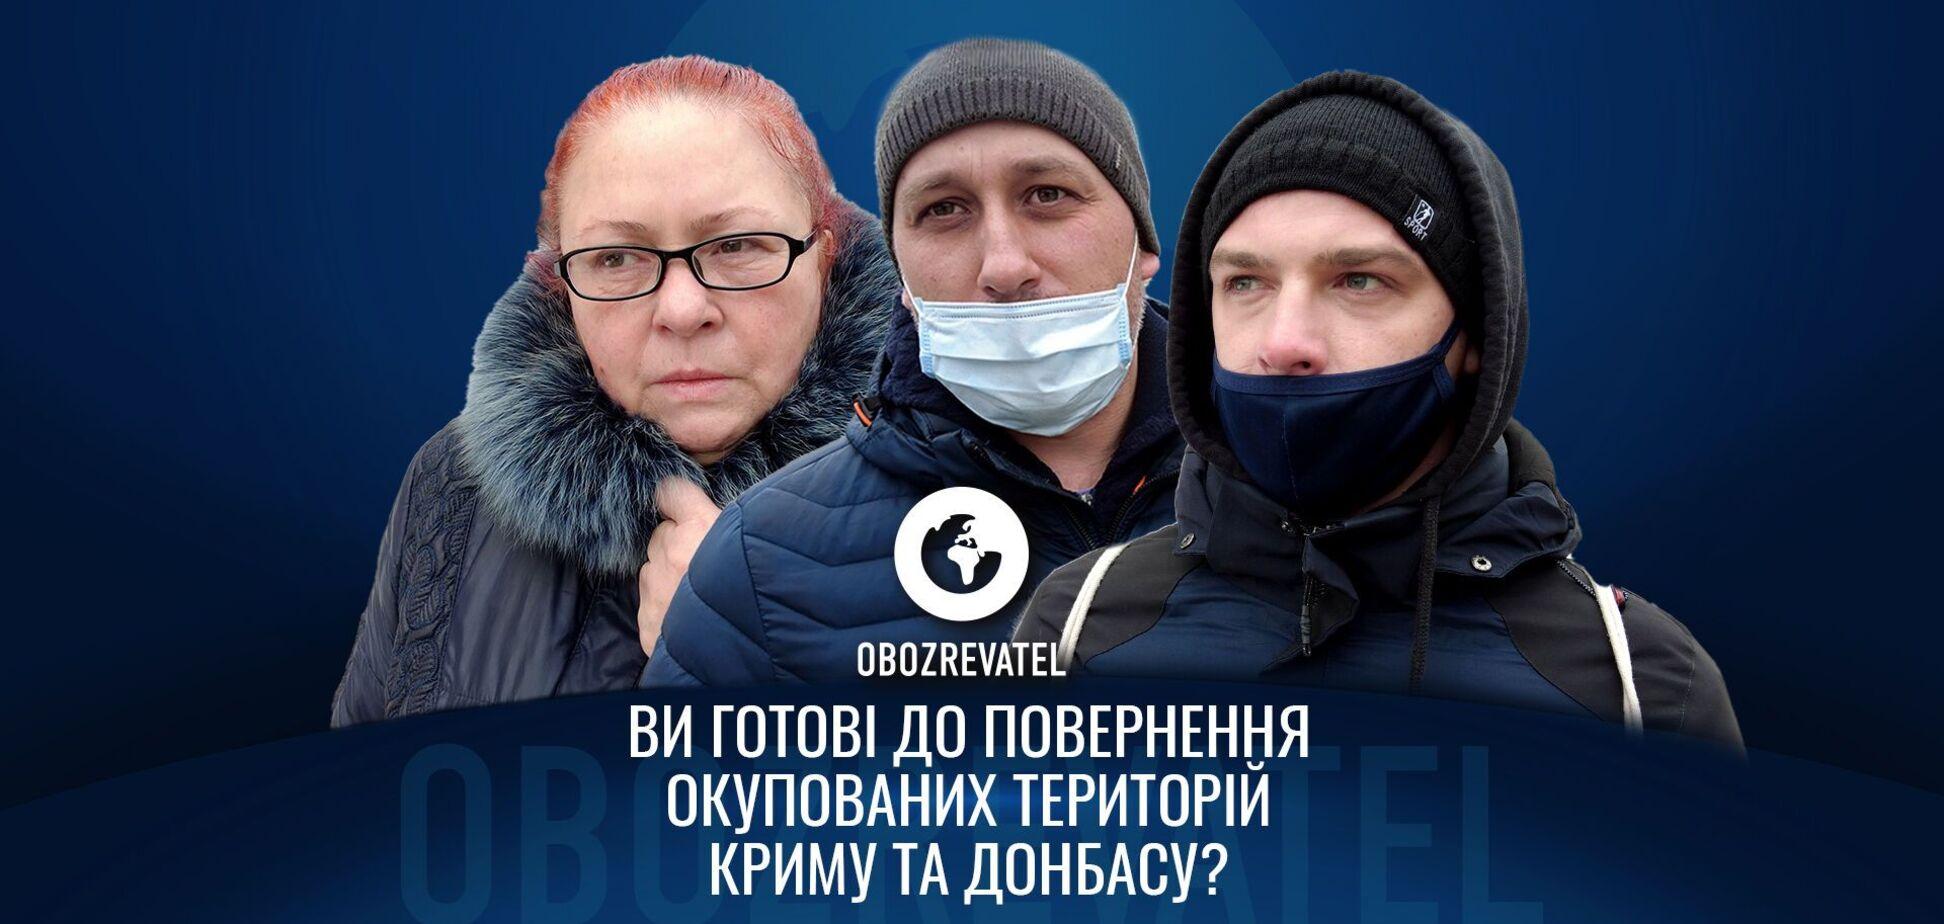 Донбас і Крим - це Україна!